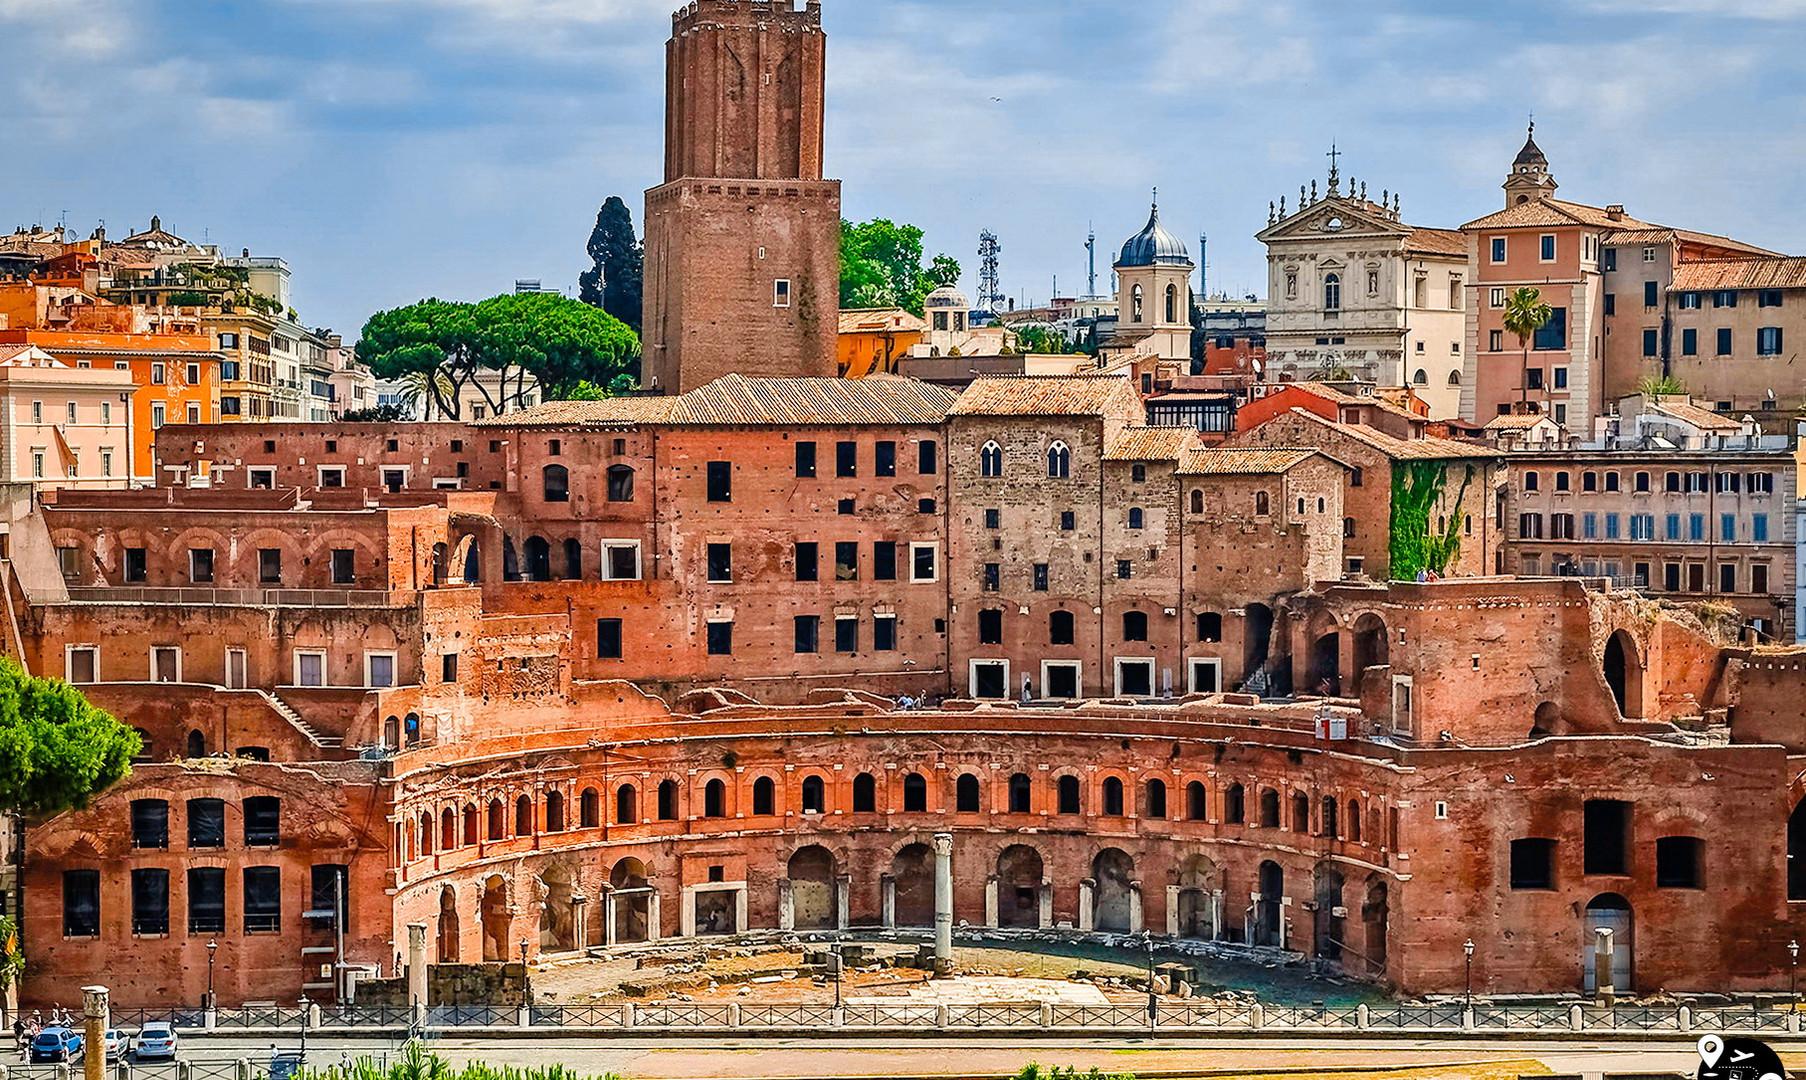 Форум Траяна, Рим